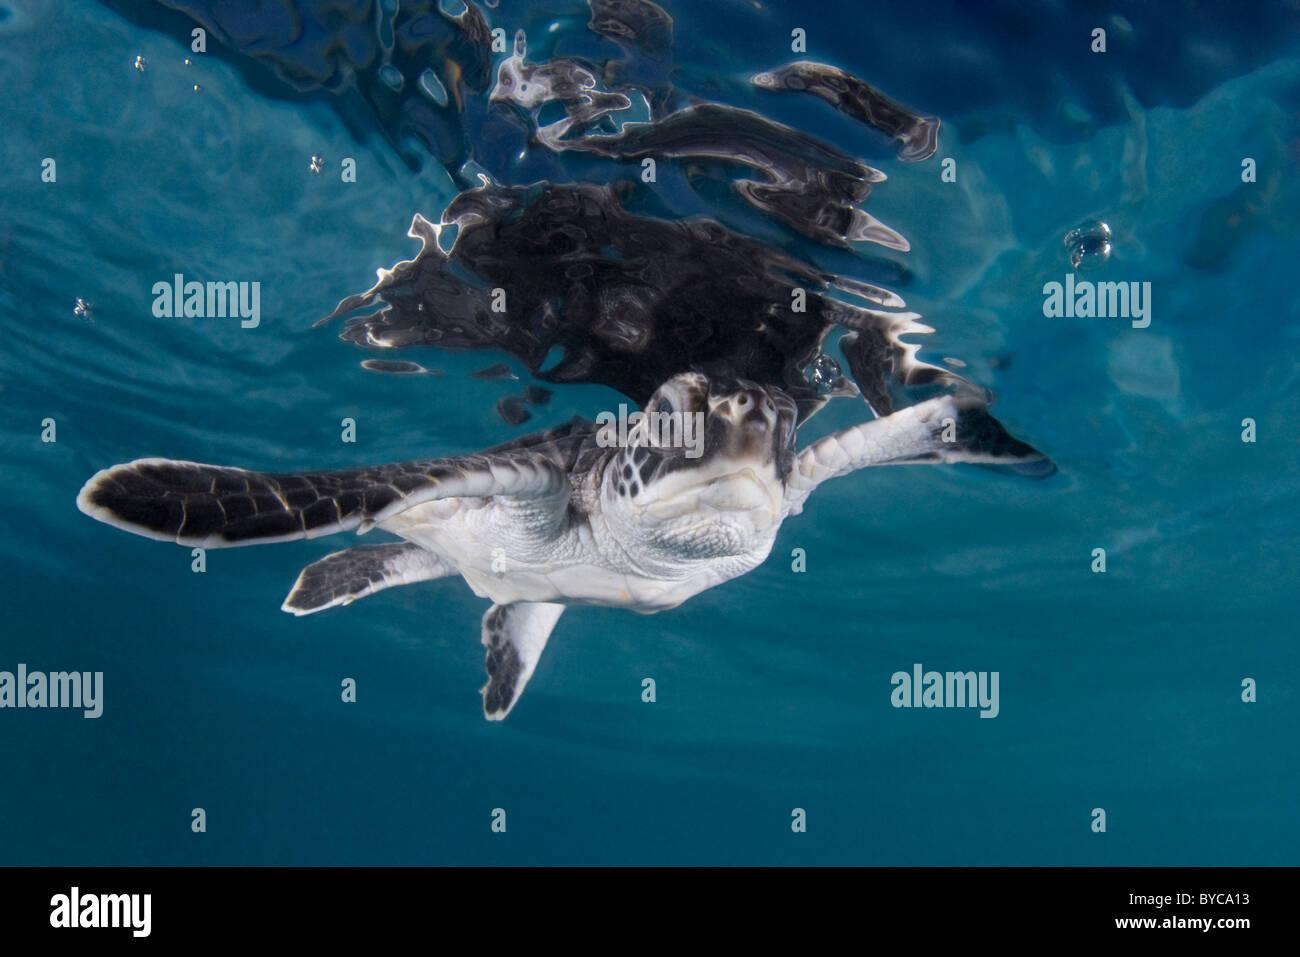 green sea turtle hatchling ( Chelonia mydas ), Endangered Species, Caribbean - Stock Image